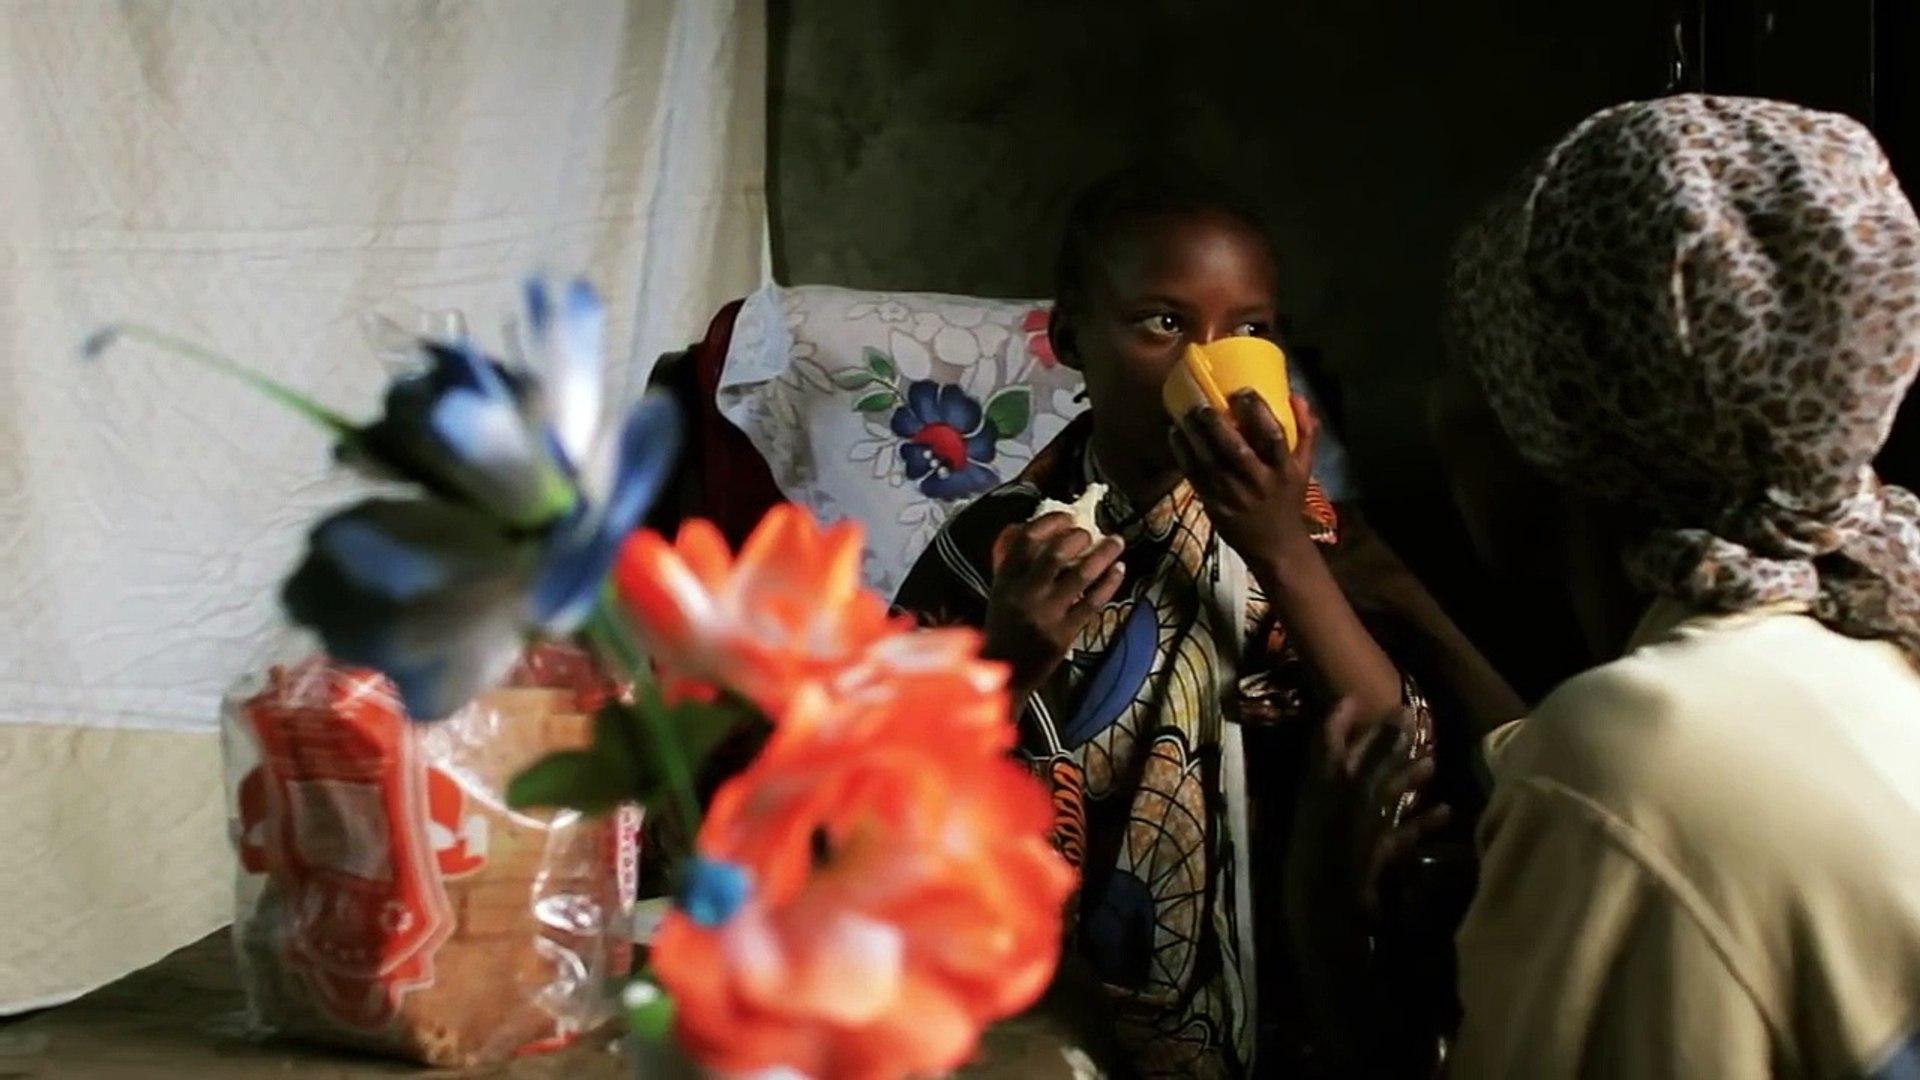 Documentary - African children. Tanzania, Africa.